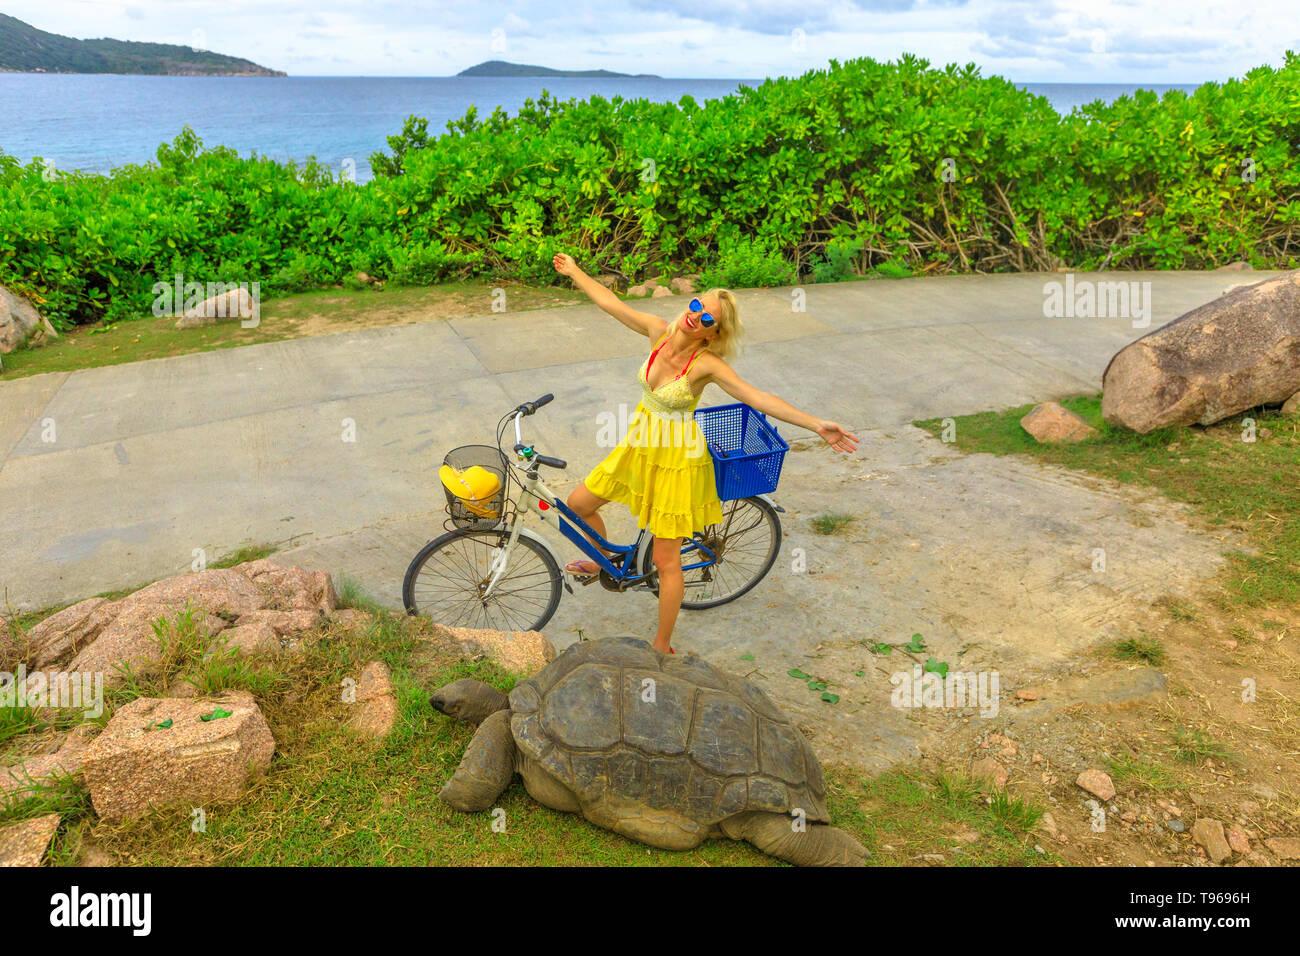 Happy caucasian lifestyle tourist woman on bicycle near Anse Banane in La Digue, Seychelles, with Aldabra Giant Tortoise, Aldabrachelys gigantea - Stock Image